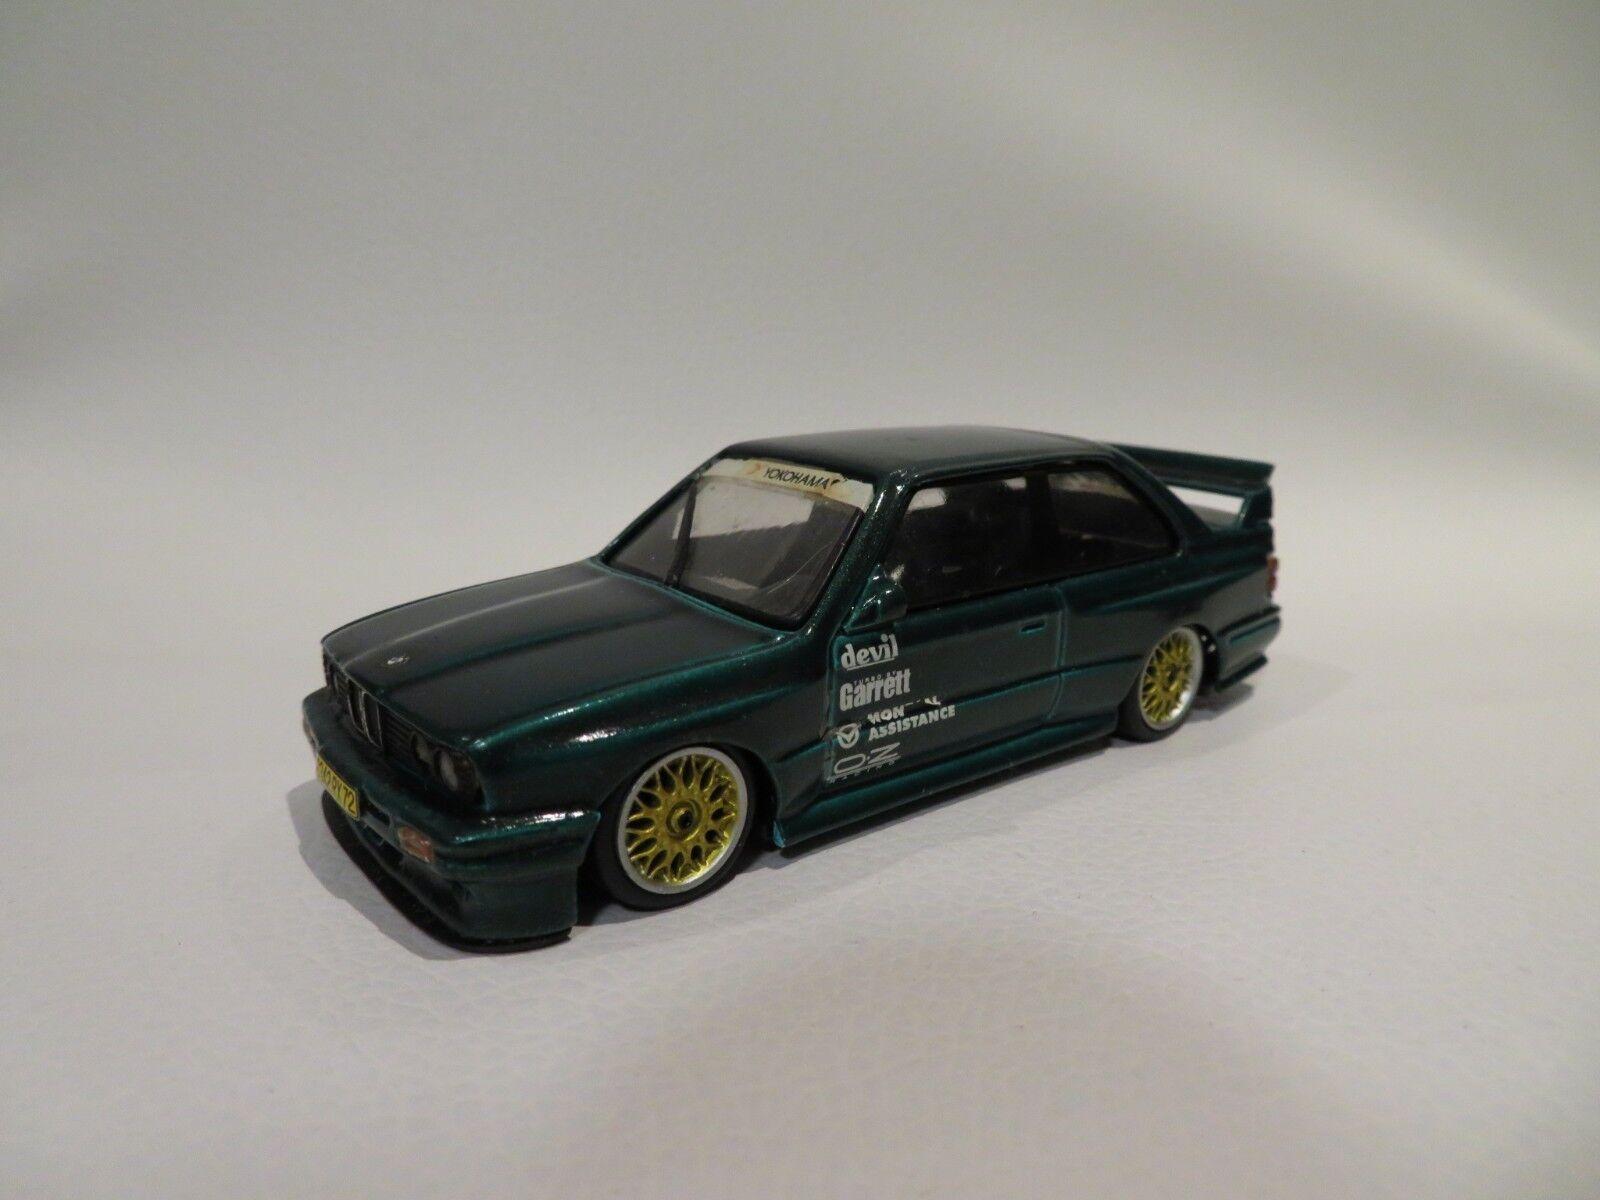 1 43 Minichamps BMW M3 Deporte Evolución Diecast